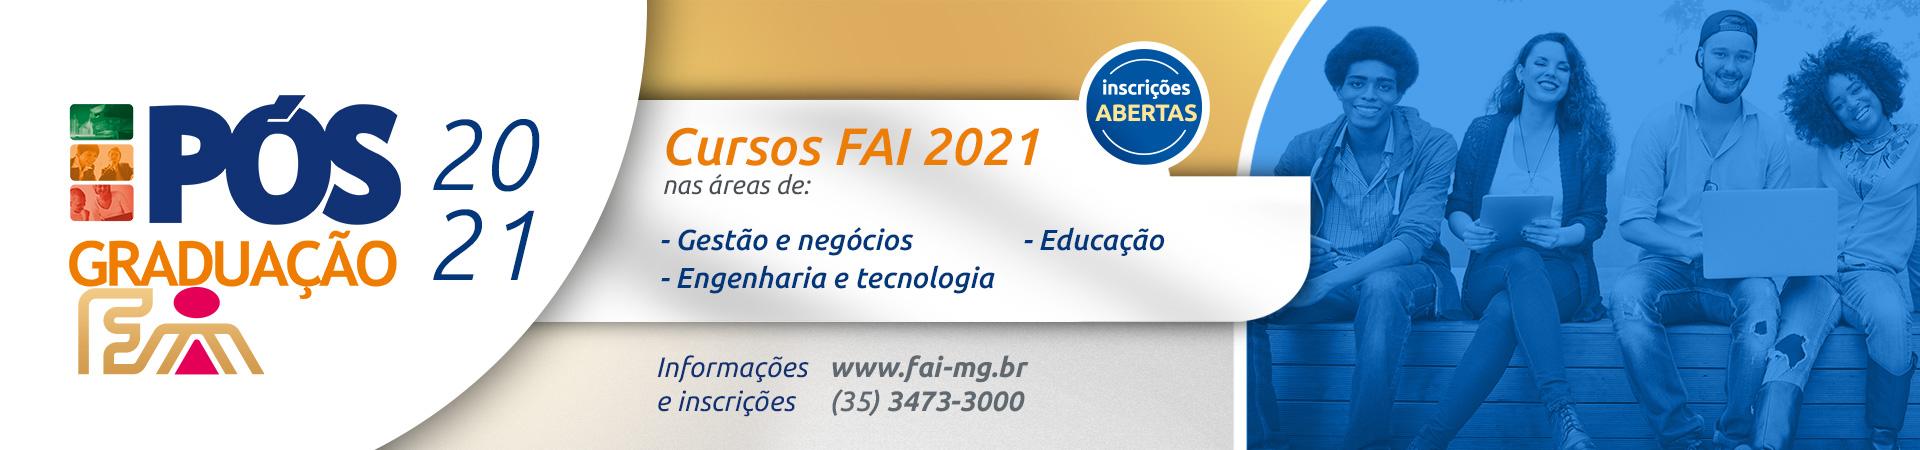 FAI_Ps_Graduao_2021_Banner_Portal